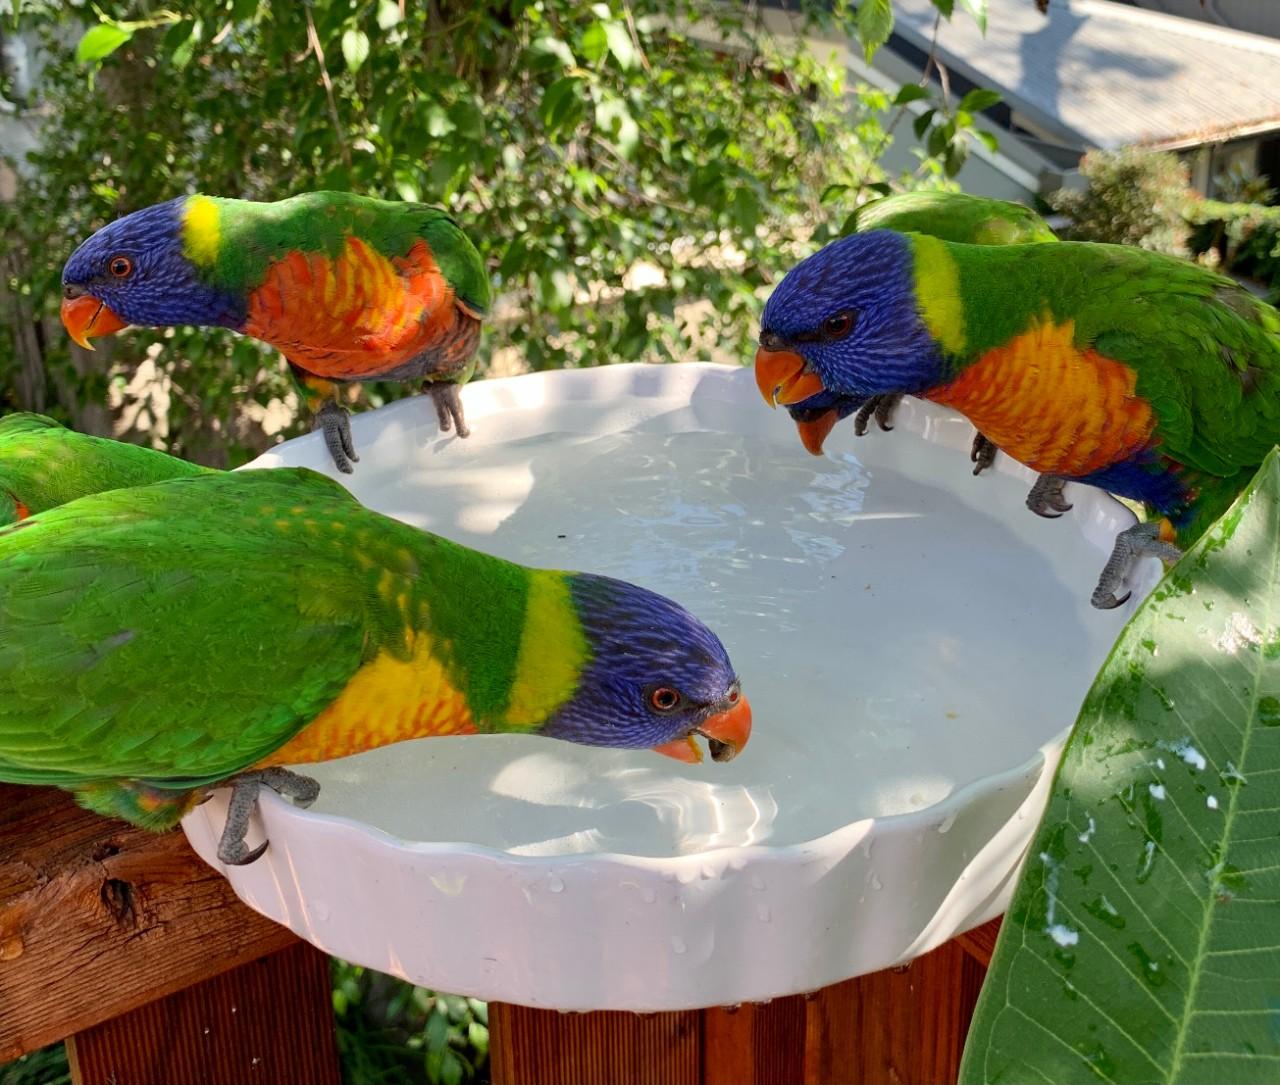 photo of a rainbow lorikeets drinking water from a birdbath